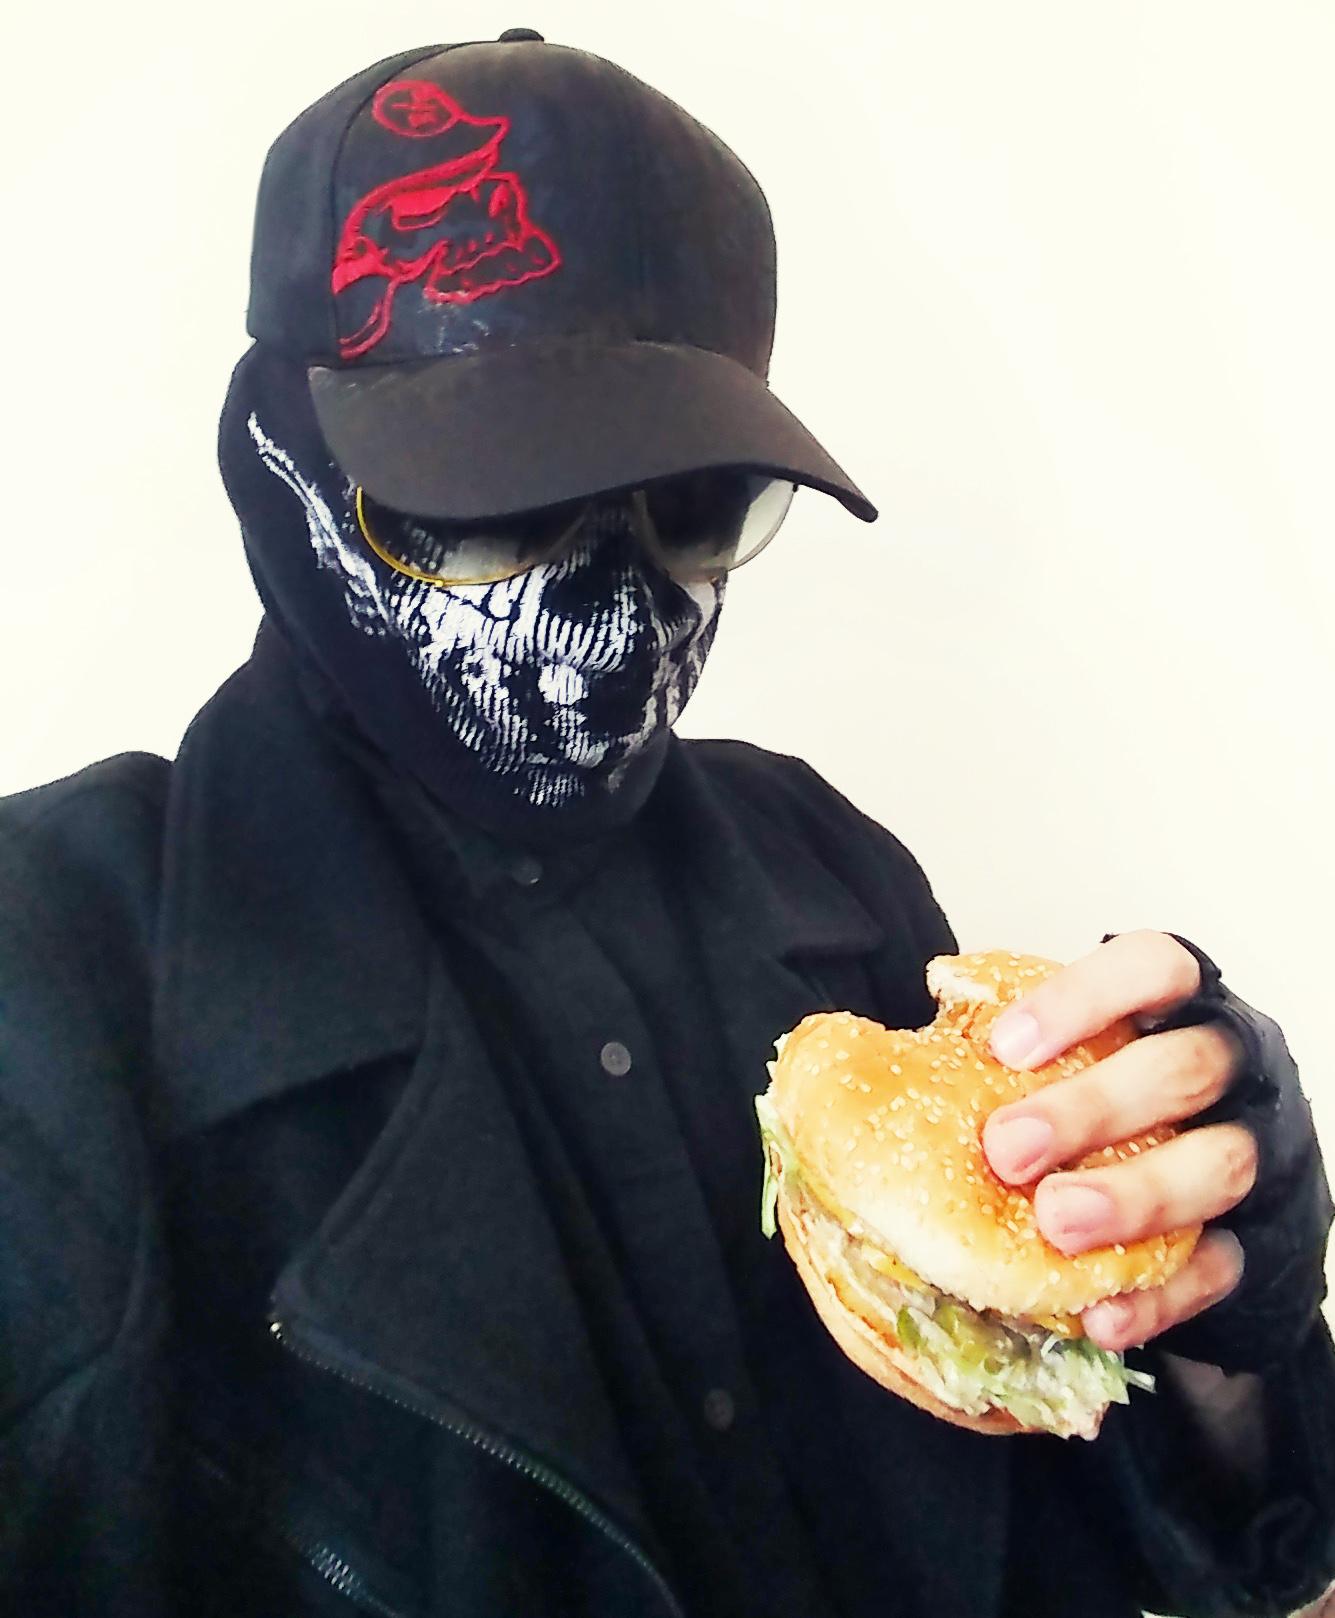 2924942_149958765582_burger.jpg